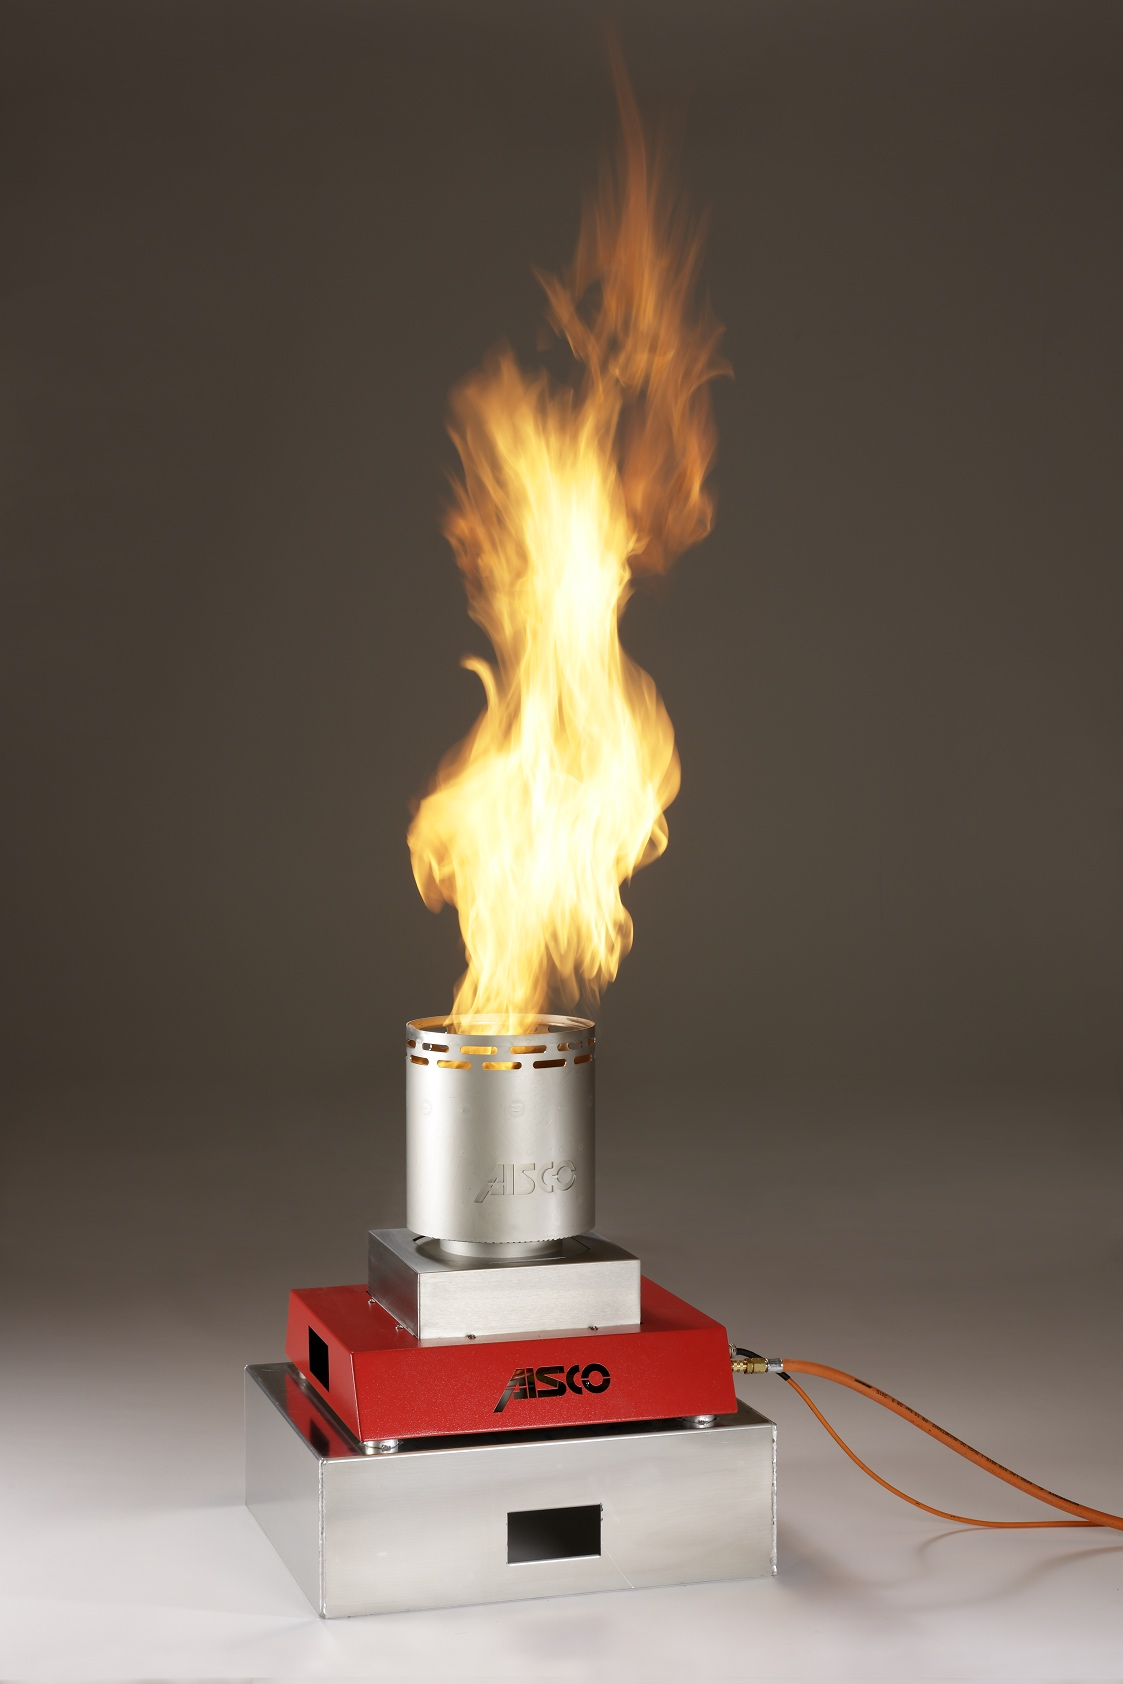 AISCO Firetrainer - Fire Trainer Ultralight UL1 mit Papierkorb